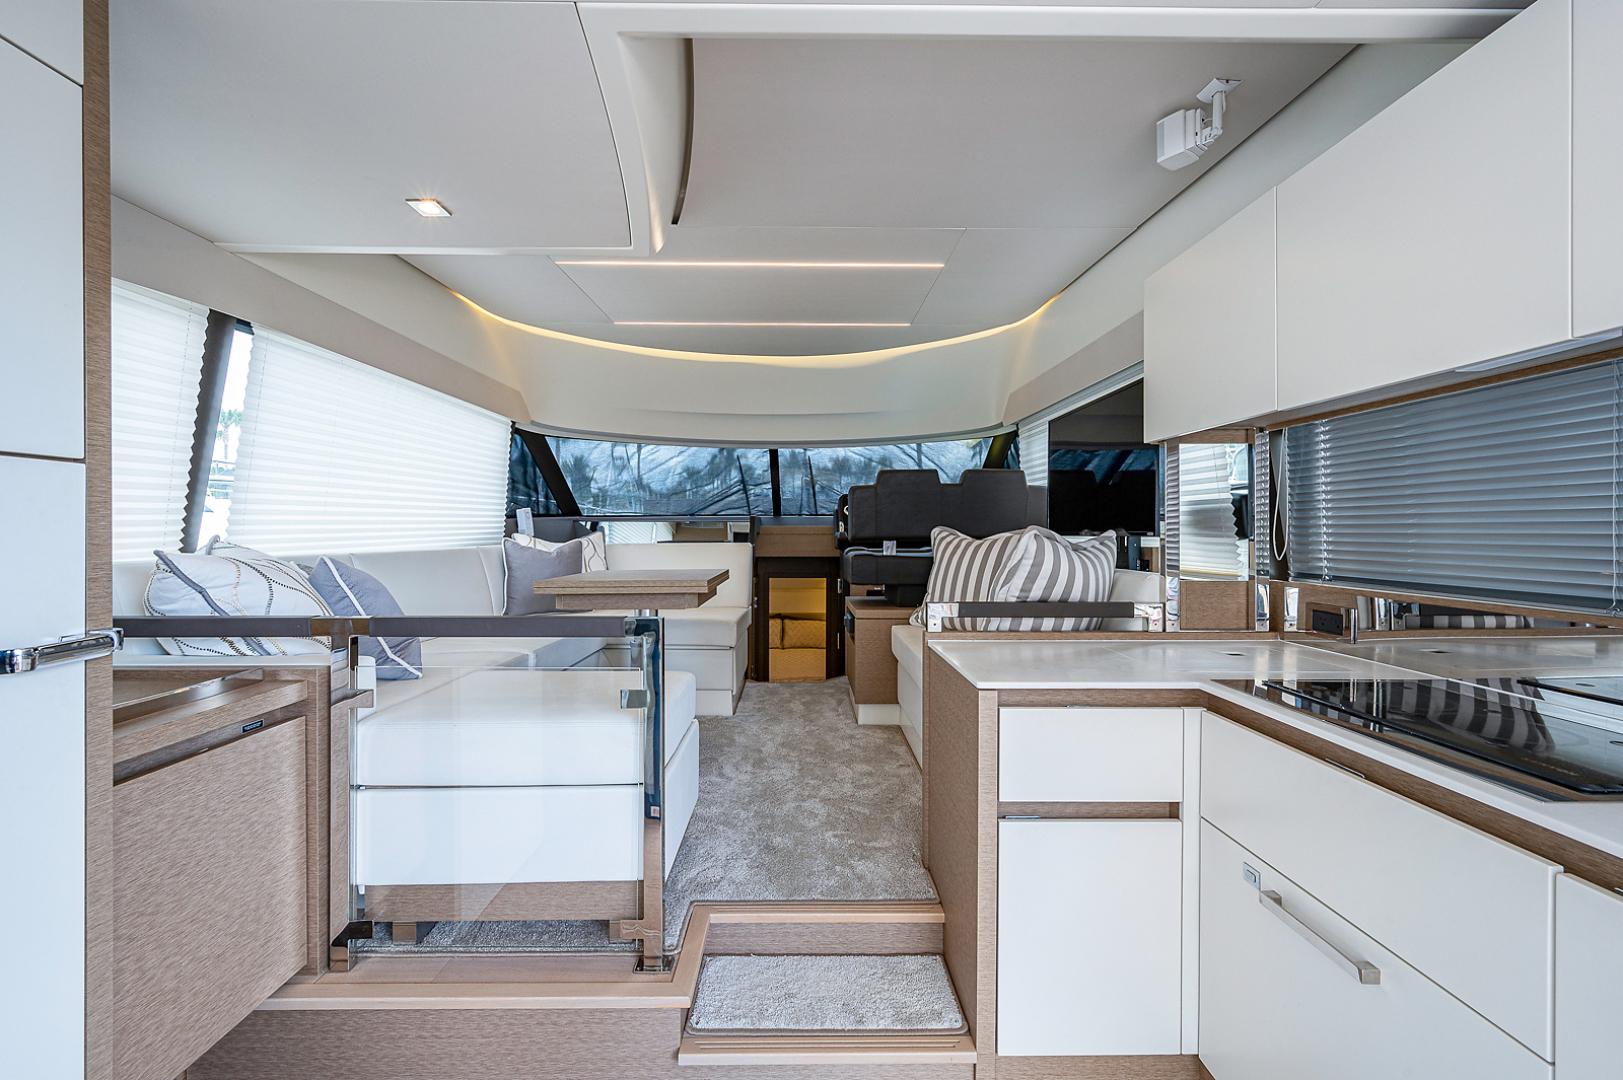 Prestige-460 Flybridge 2018-SEAQUEL Palm Beach Gardens-Florida-United States-Galley/Salon-1351148 | Thumbnail